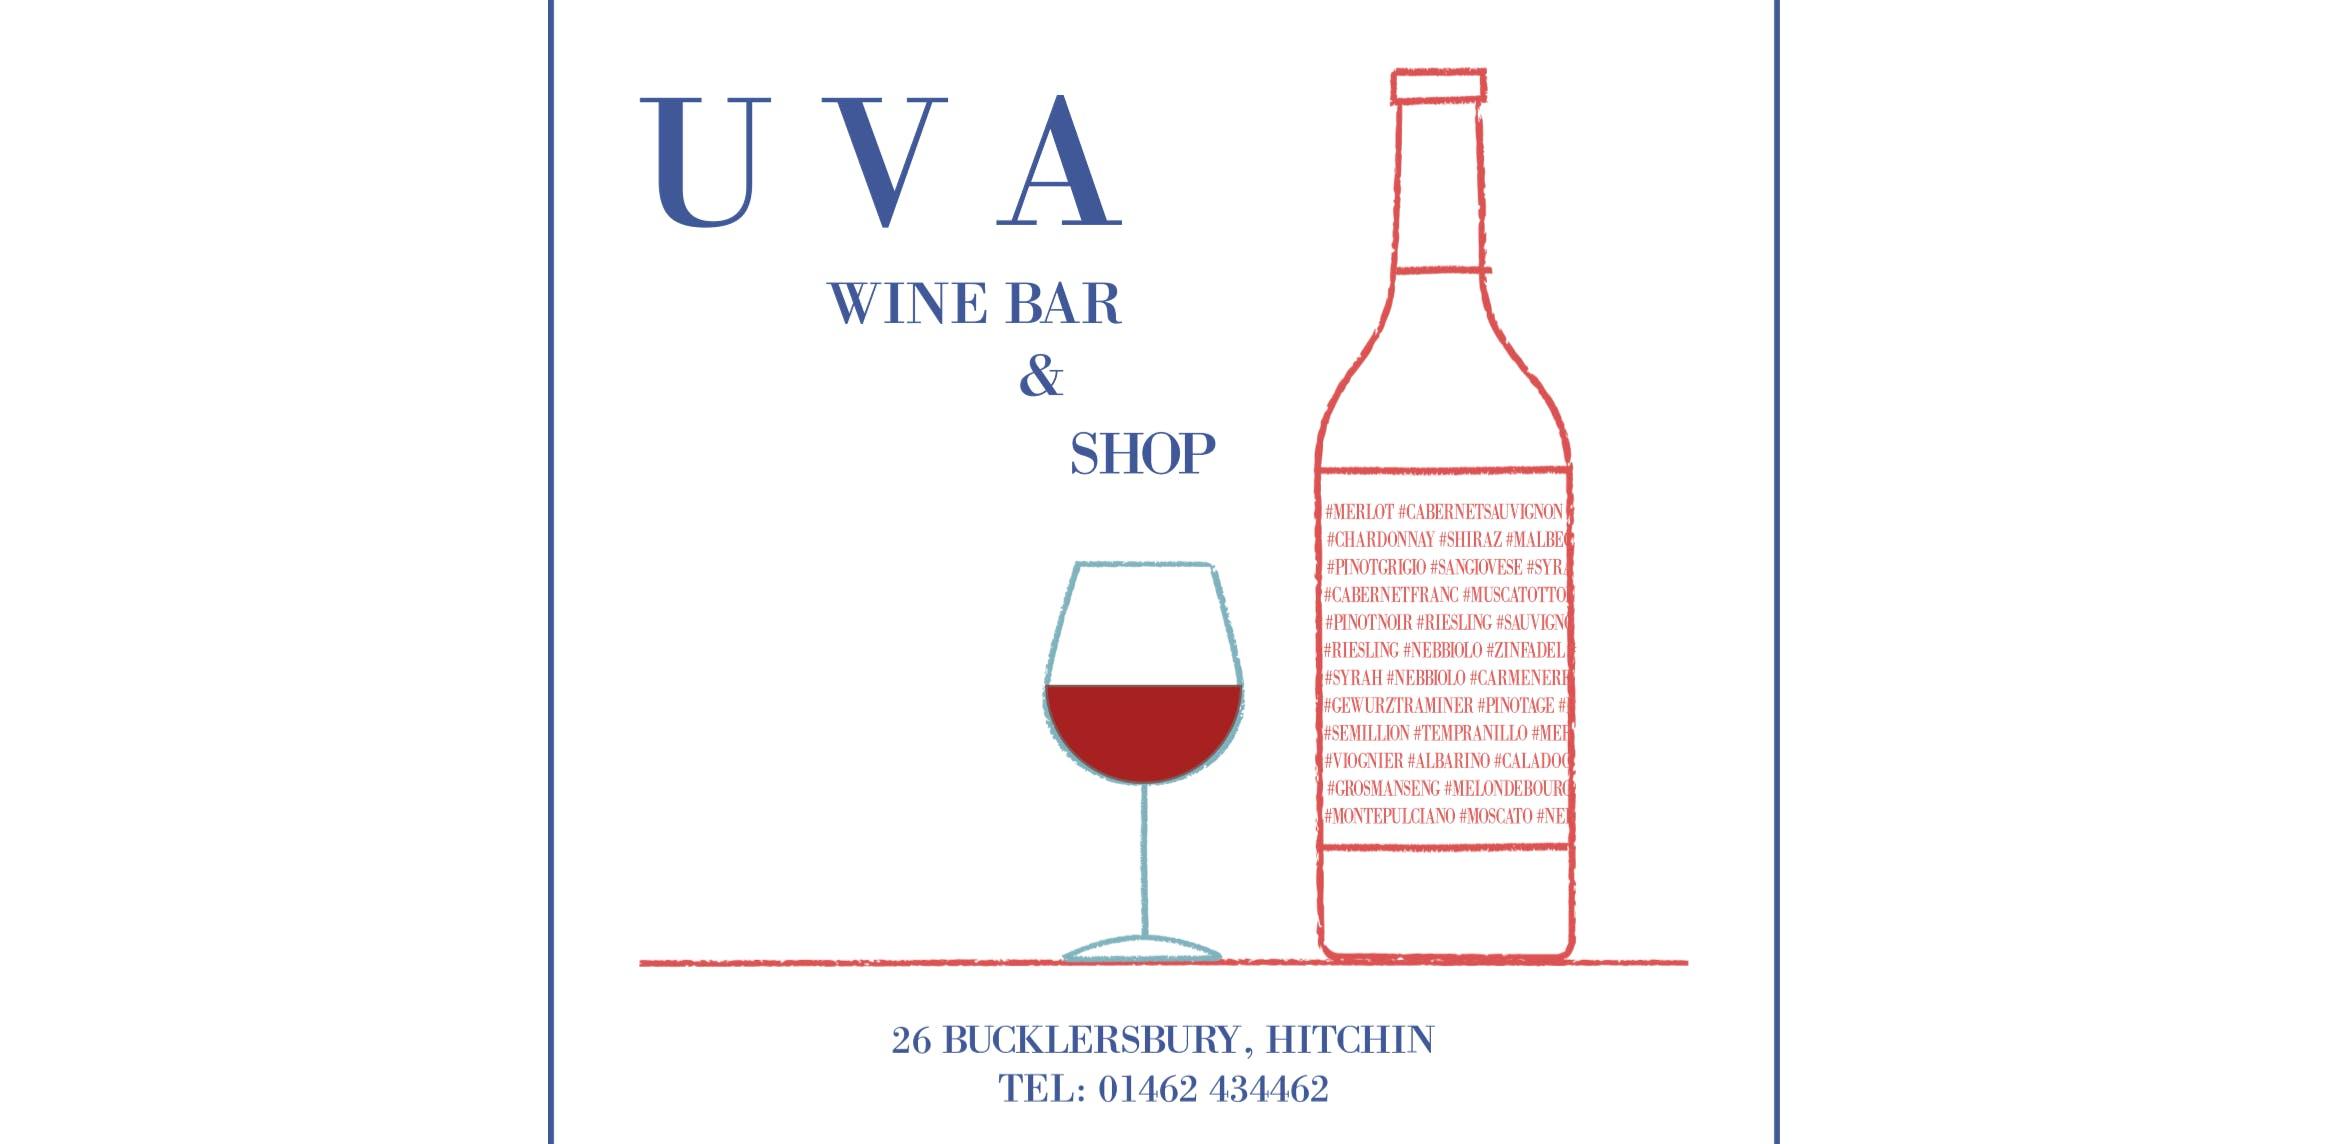 Uva Wine Bar & Shop Opening (Tuesday)